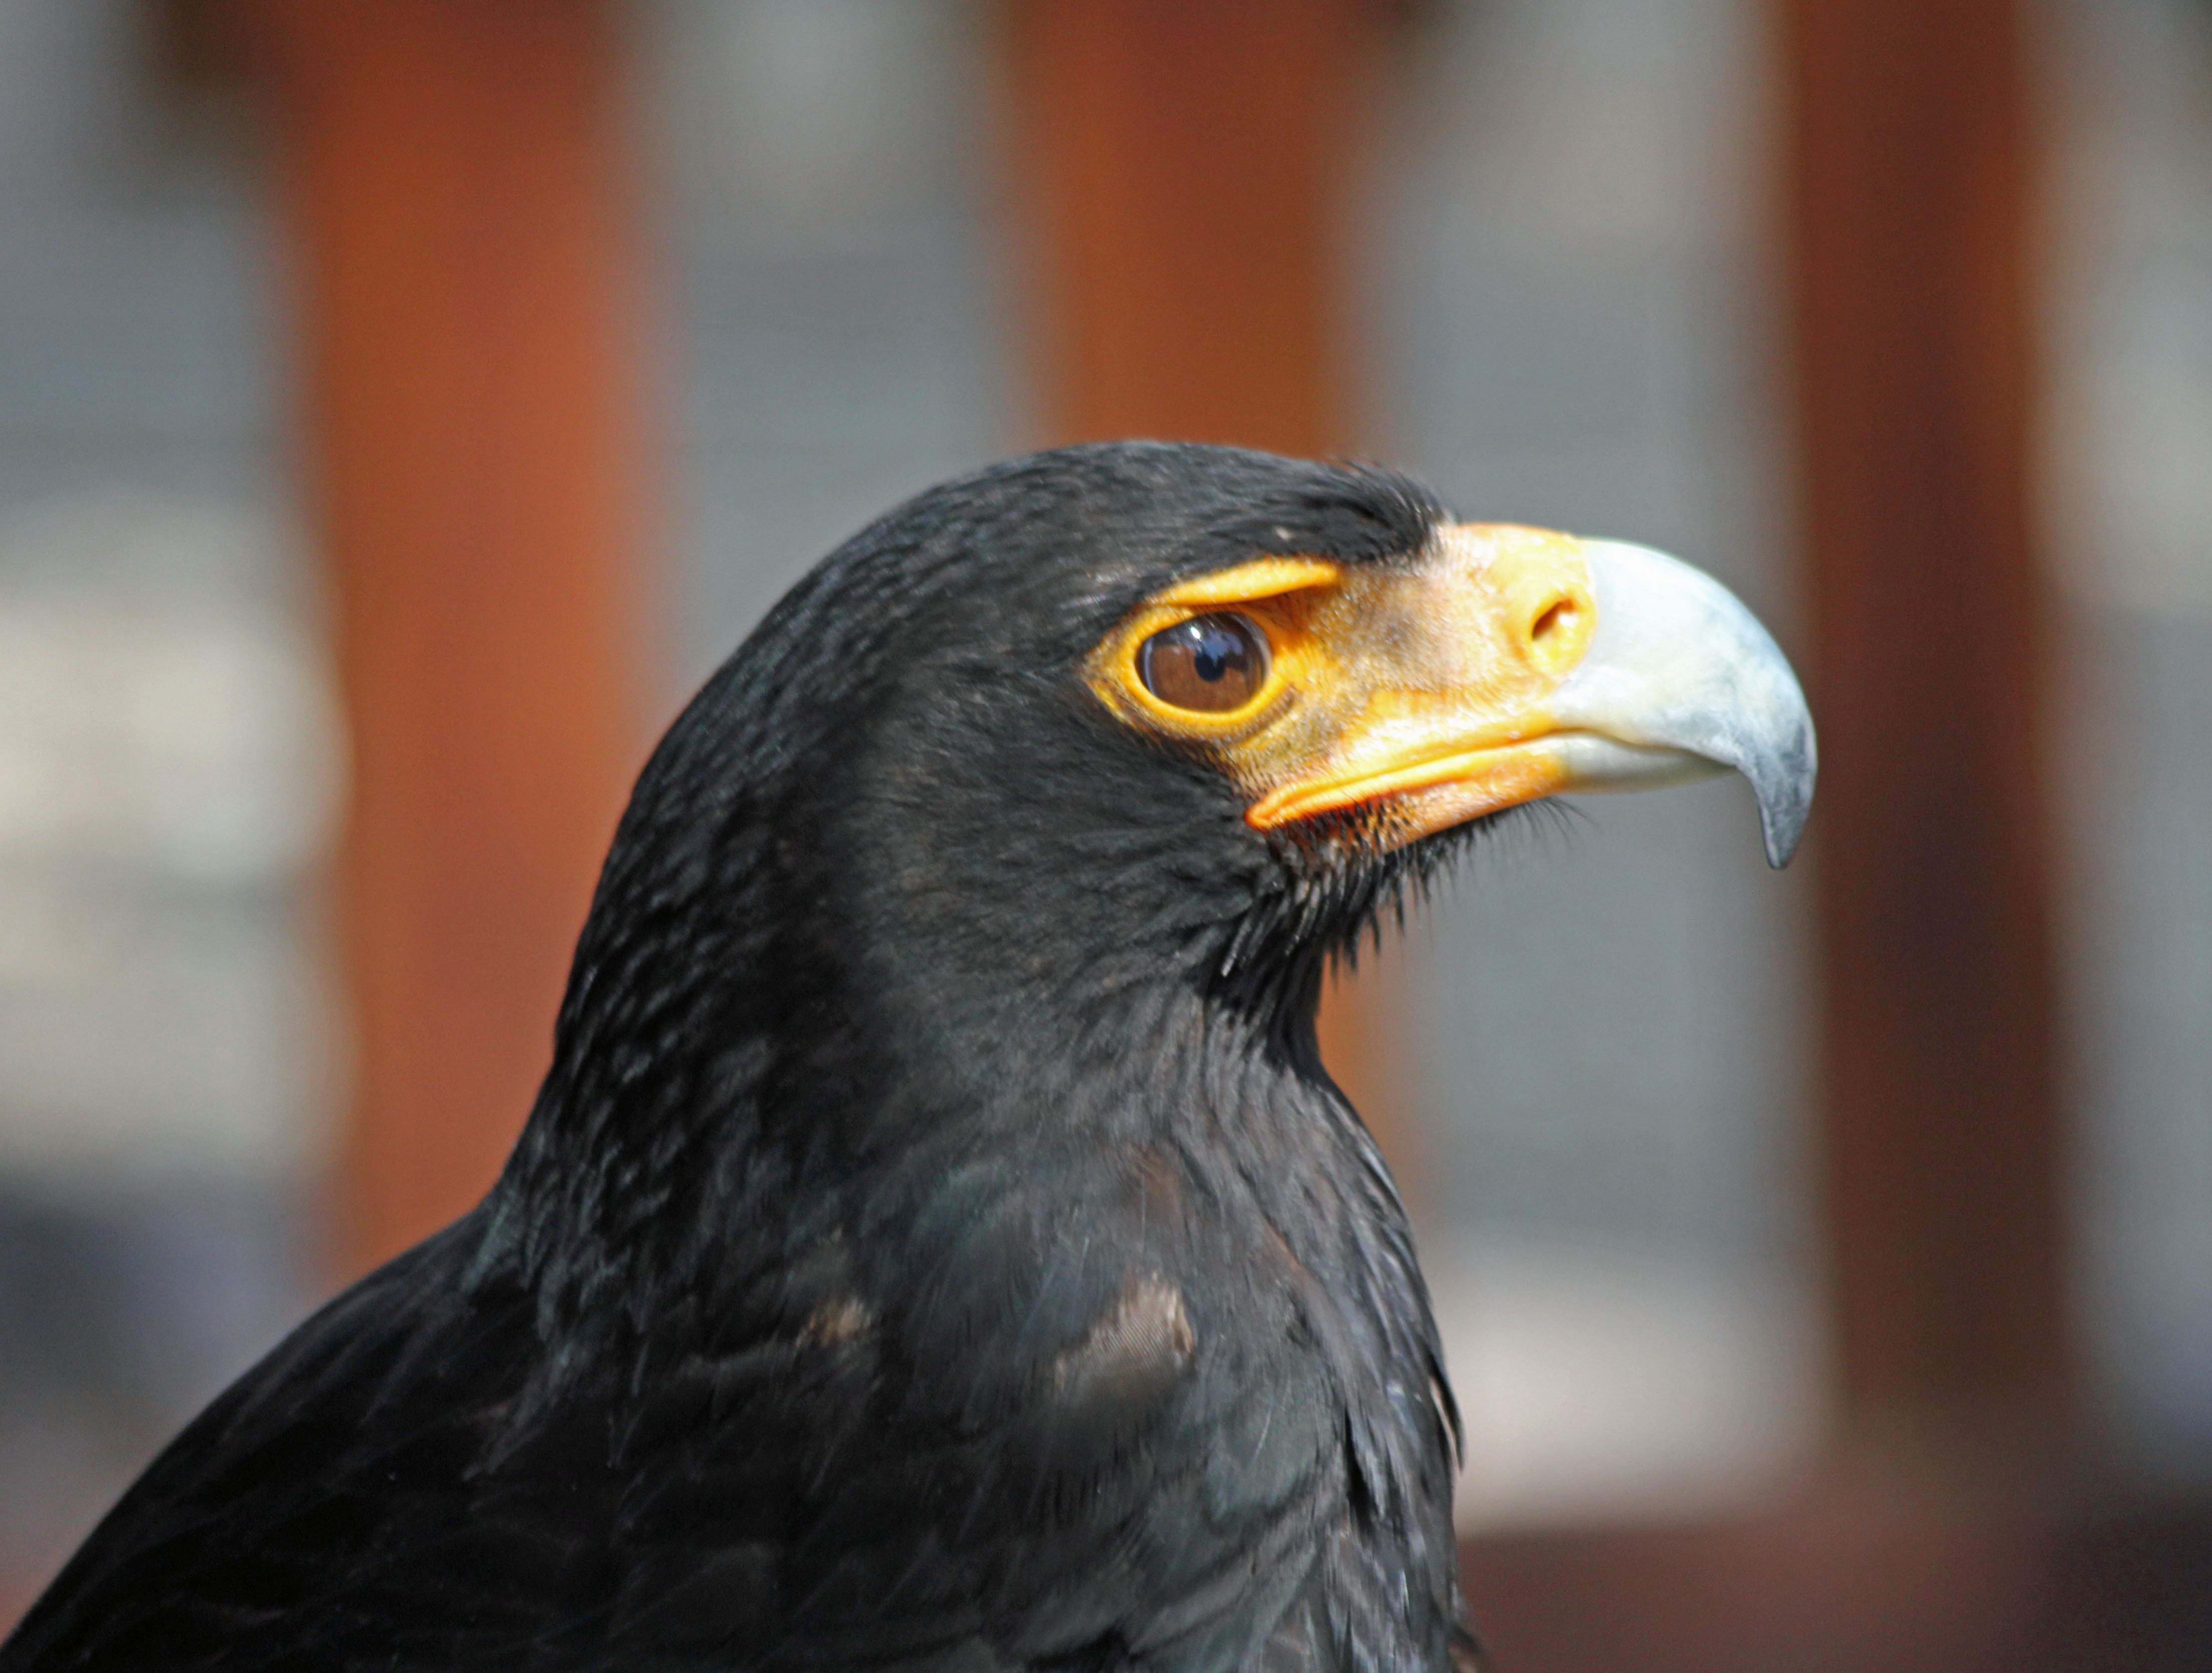 http://upload.wikimedia.org/wikipedia/commons/6/60/Black_Eagle_RWD.jpg